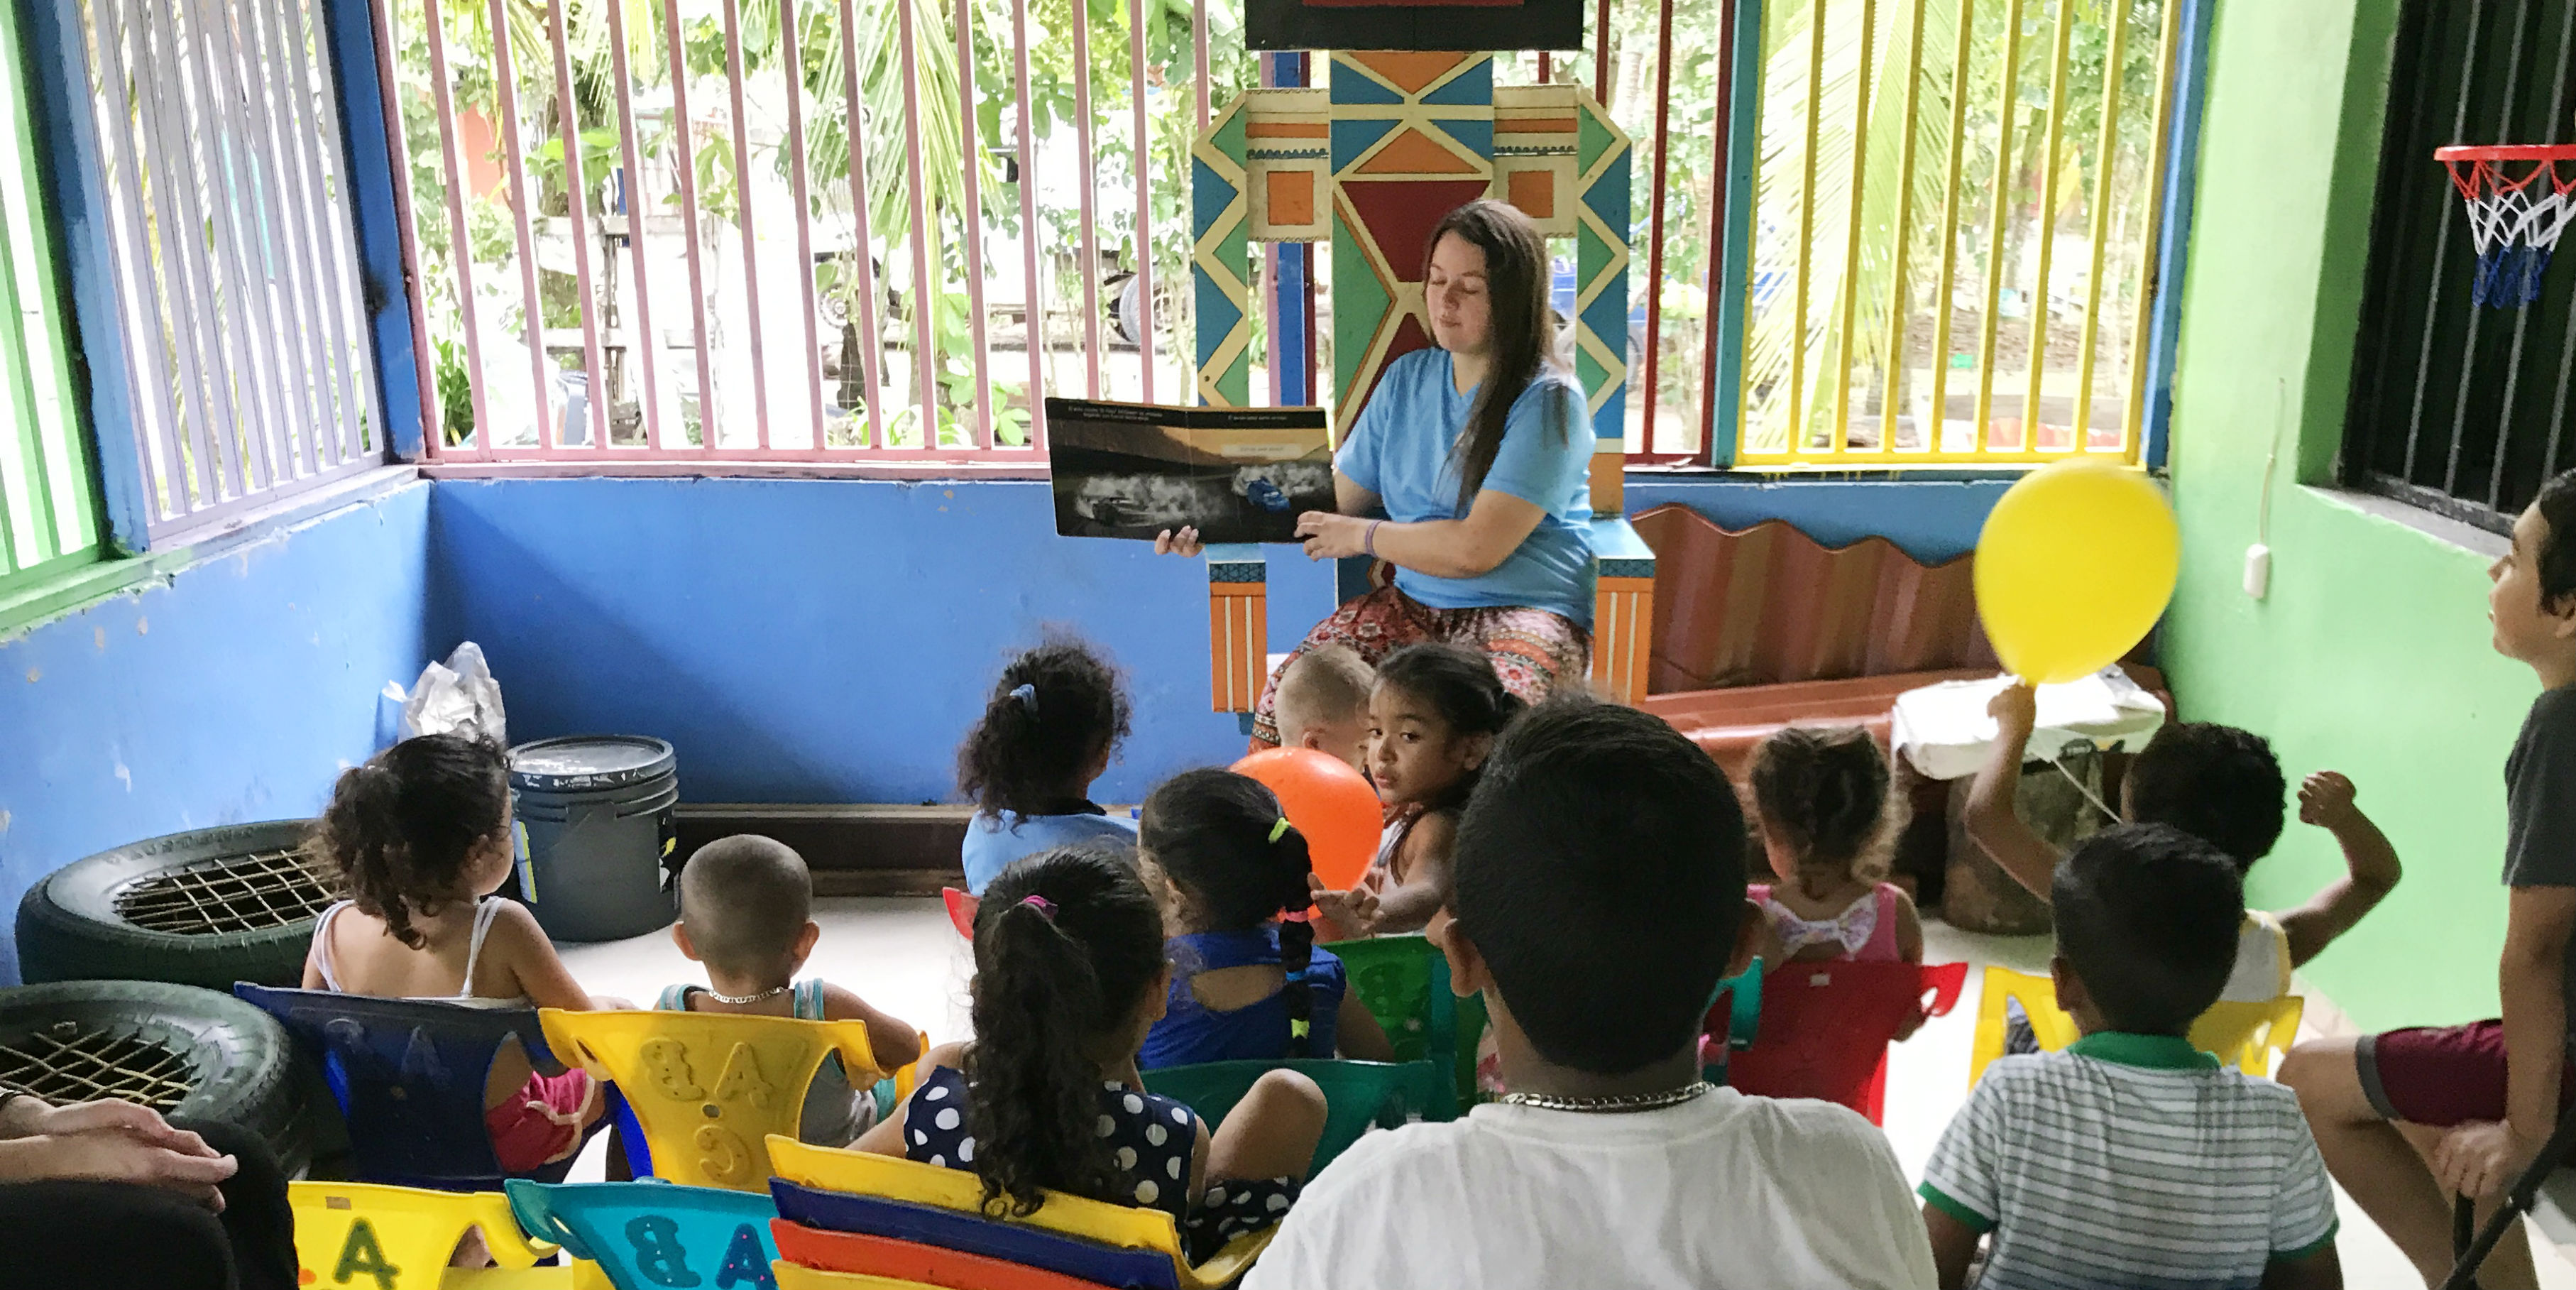 A gap year volunteer reads to children in Costa Rica.